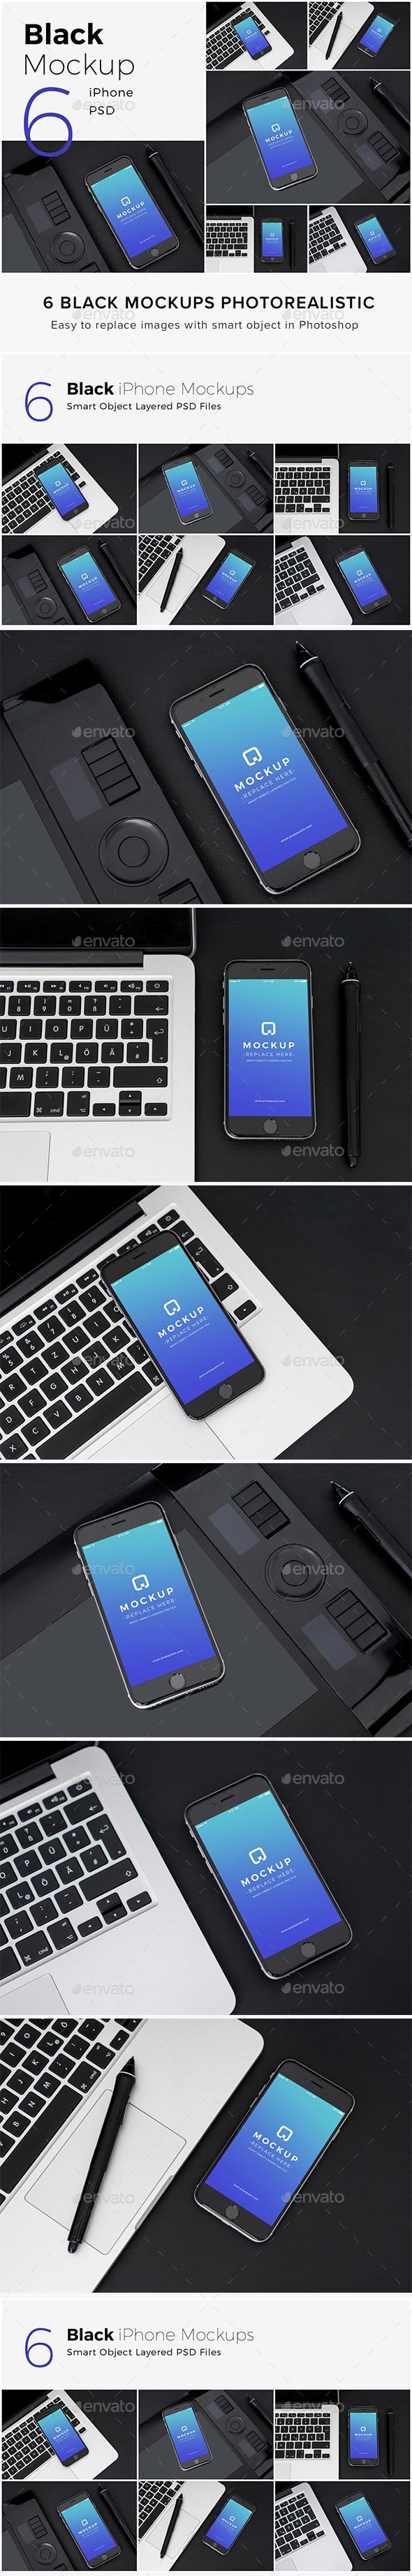 Black Mockups iPhone Pack - Product Mock-Ups Graphics